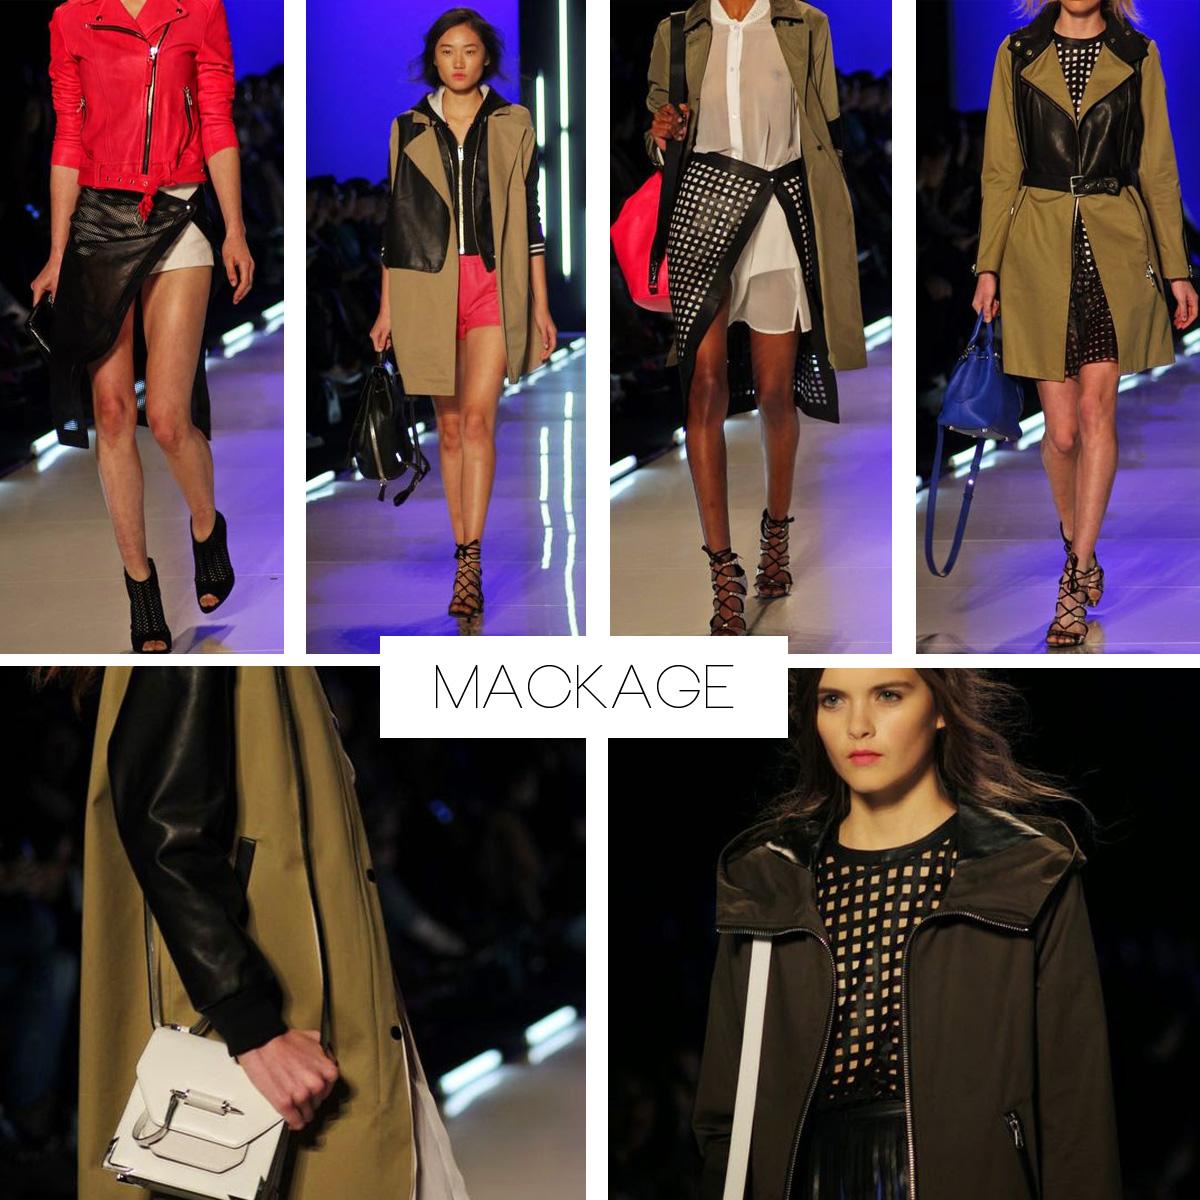 toronto fashion week 06 mackage